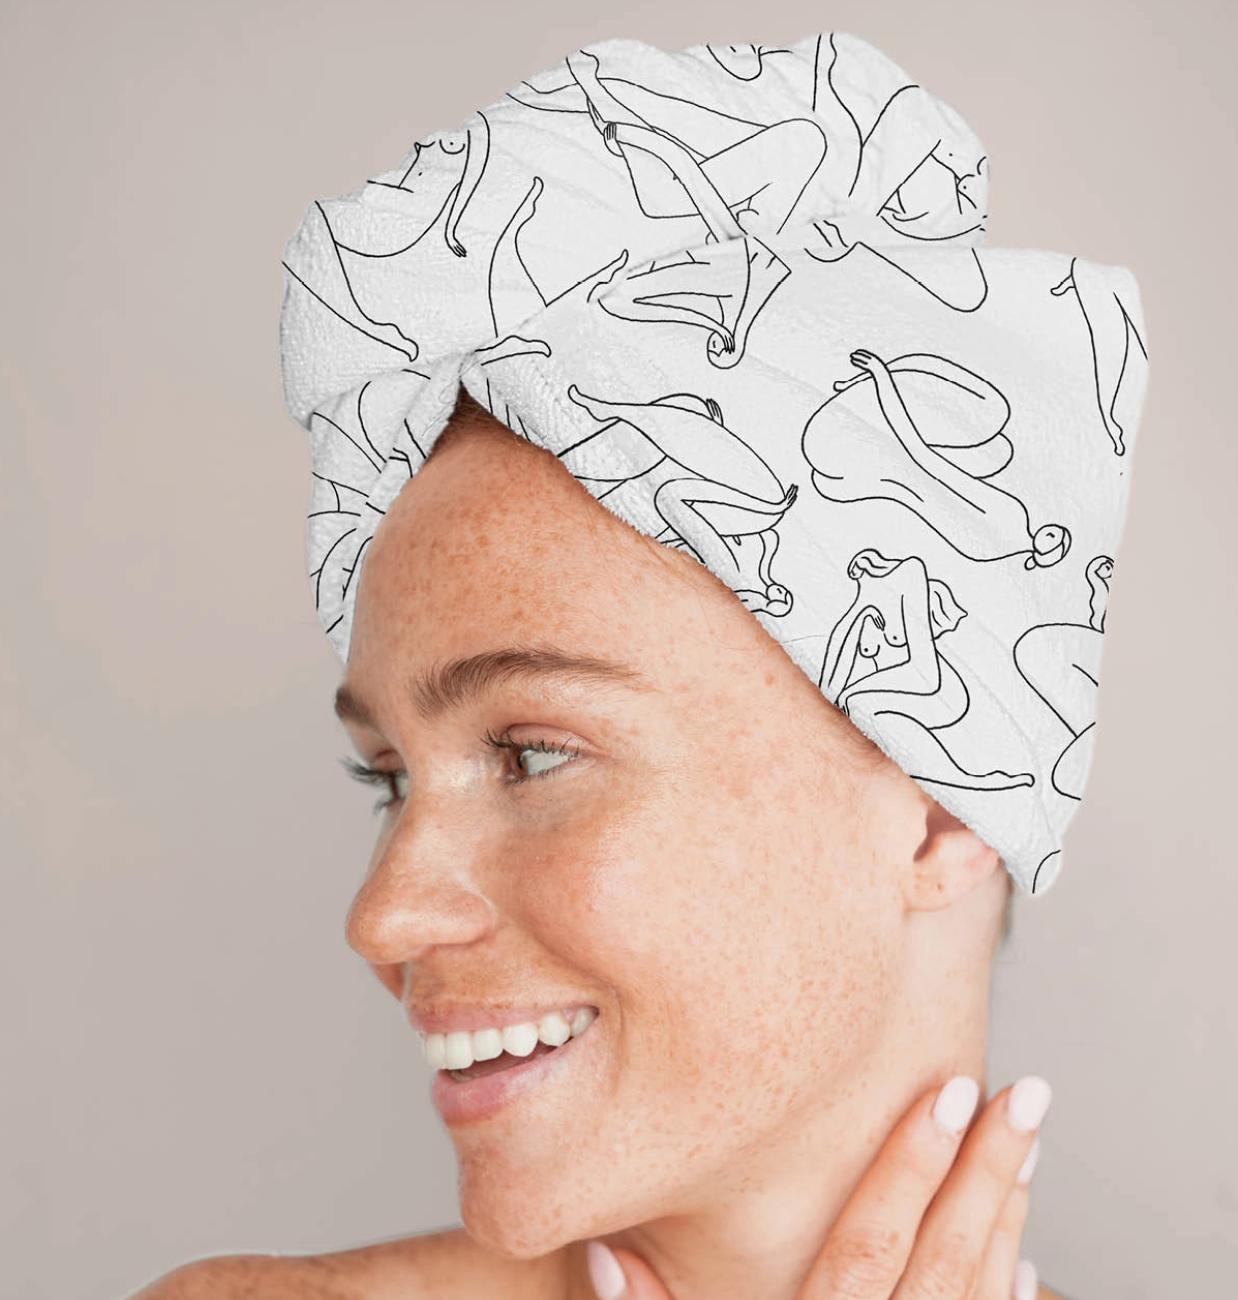 Kitsch Microfiber Hair Towel - Body Positivity Drawing